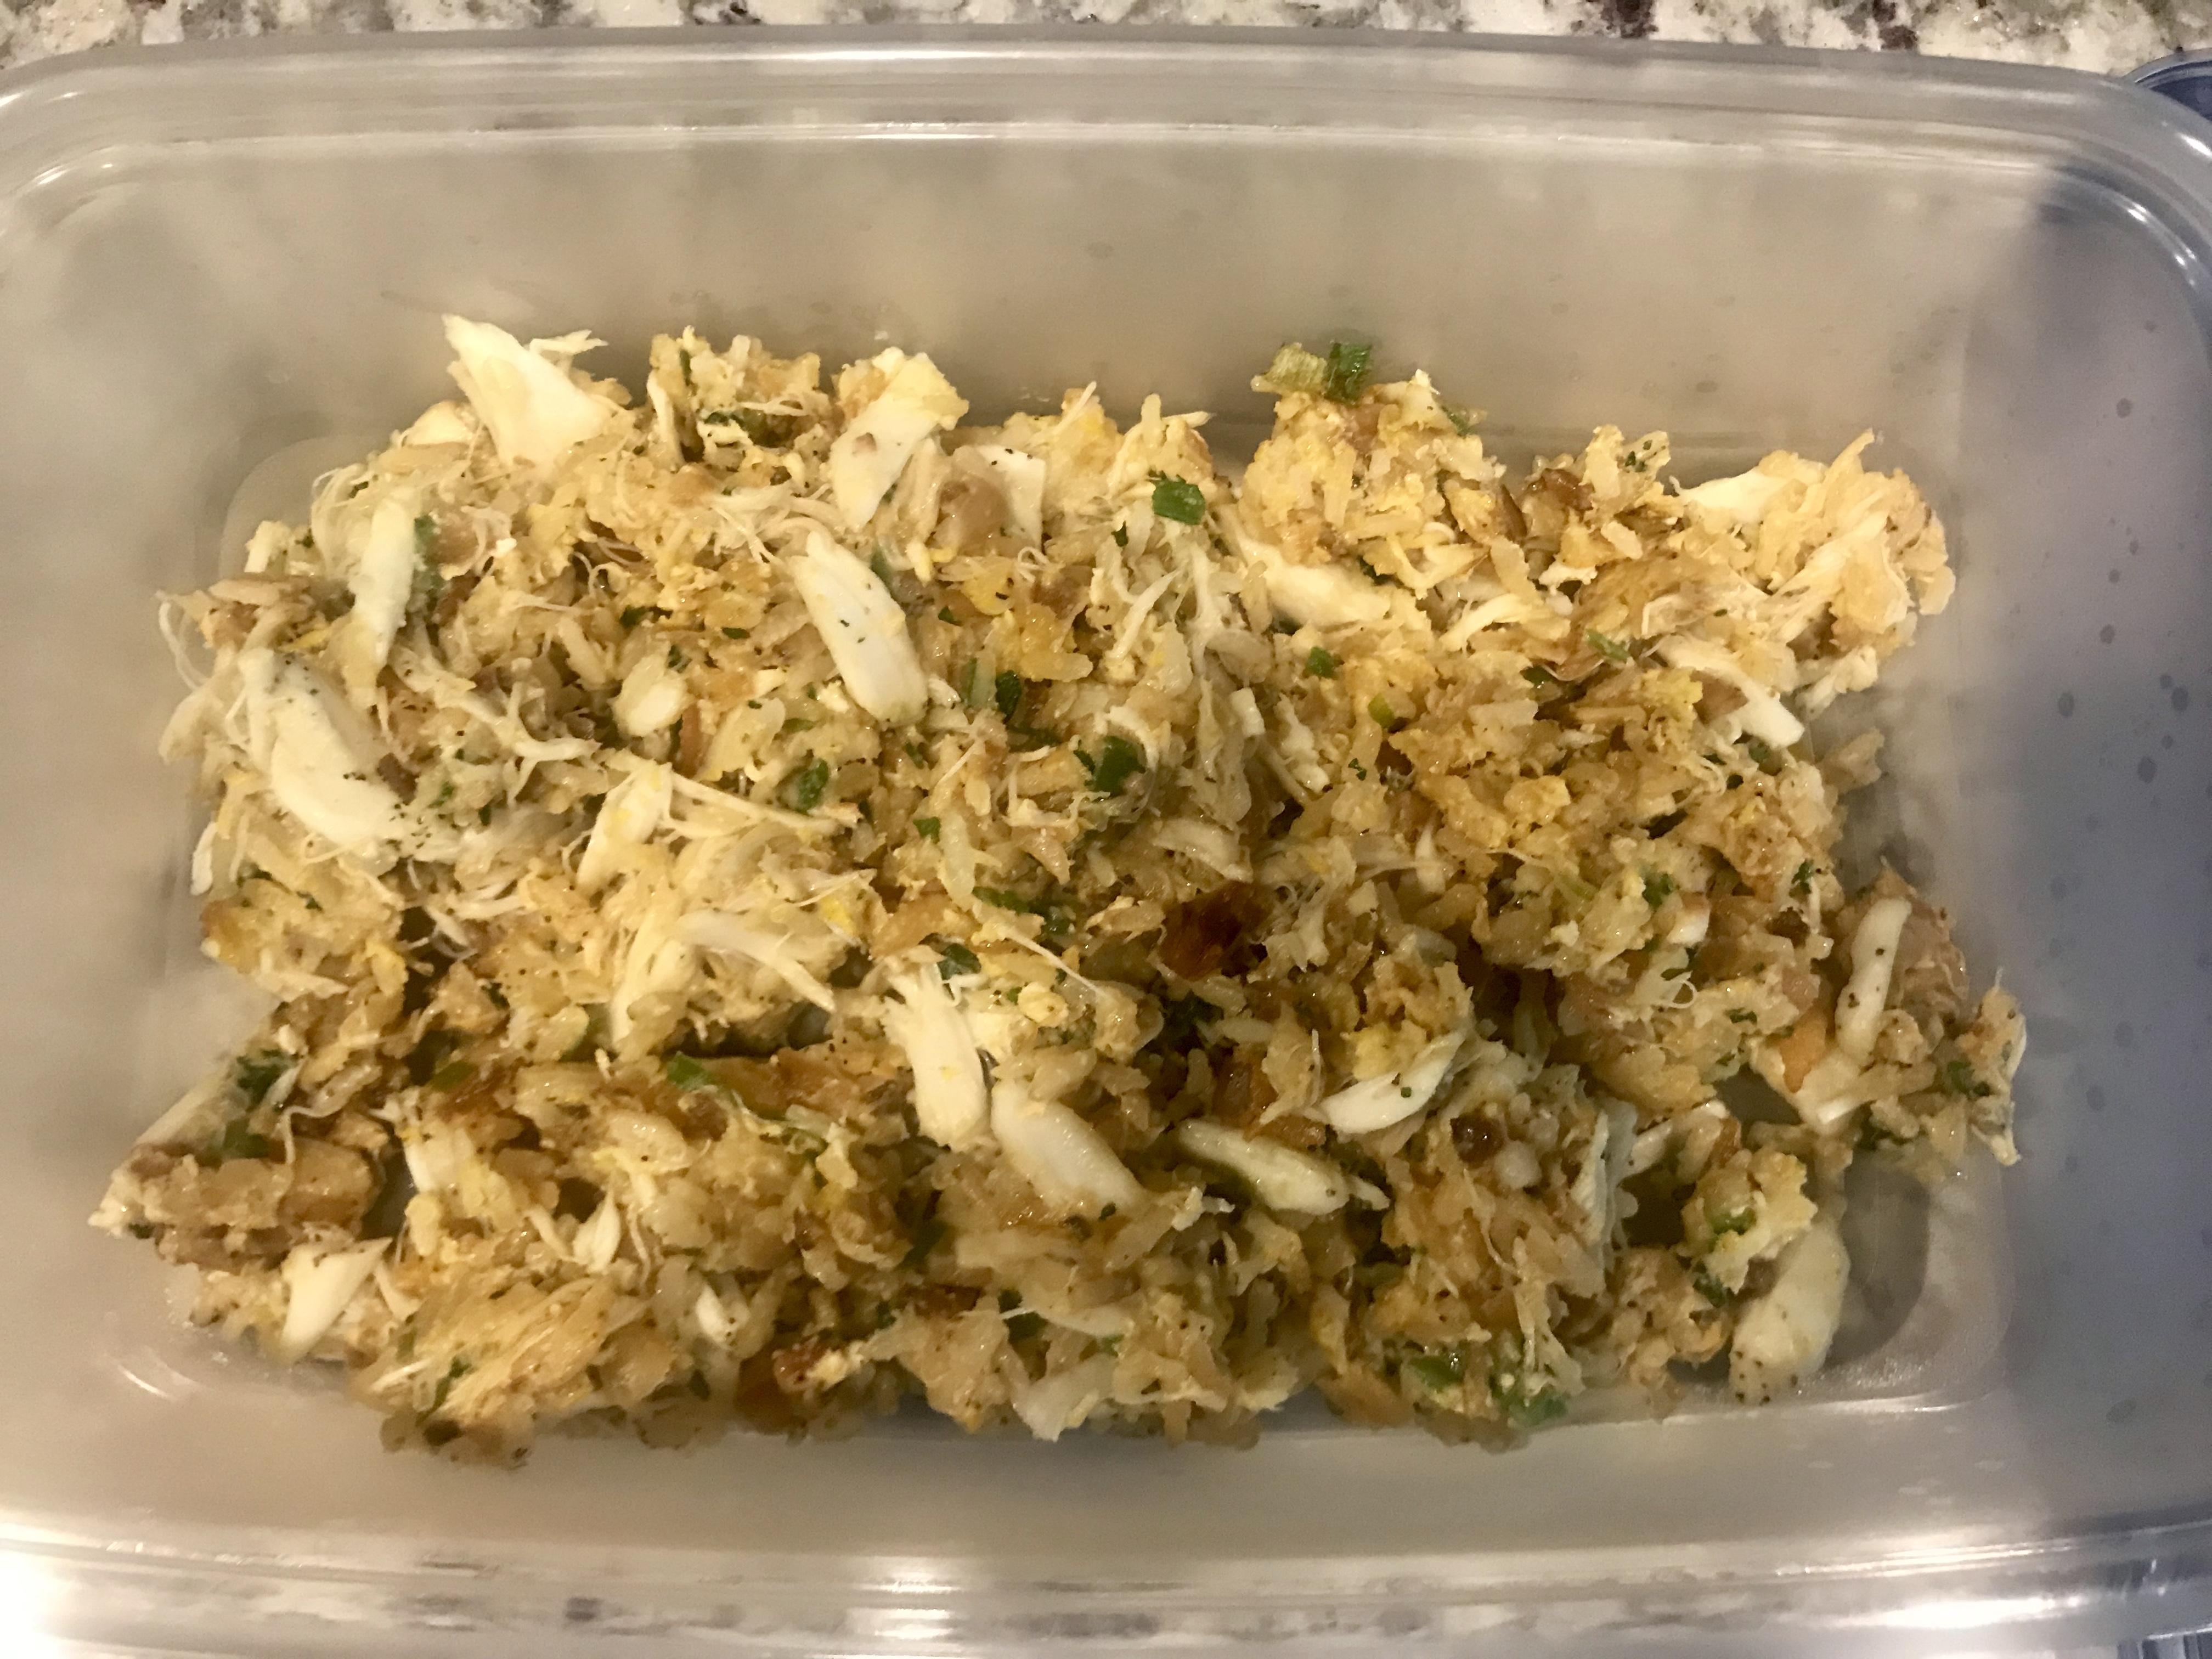 Crab Fried Rice Sbrooks726